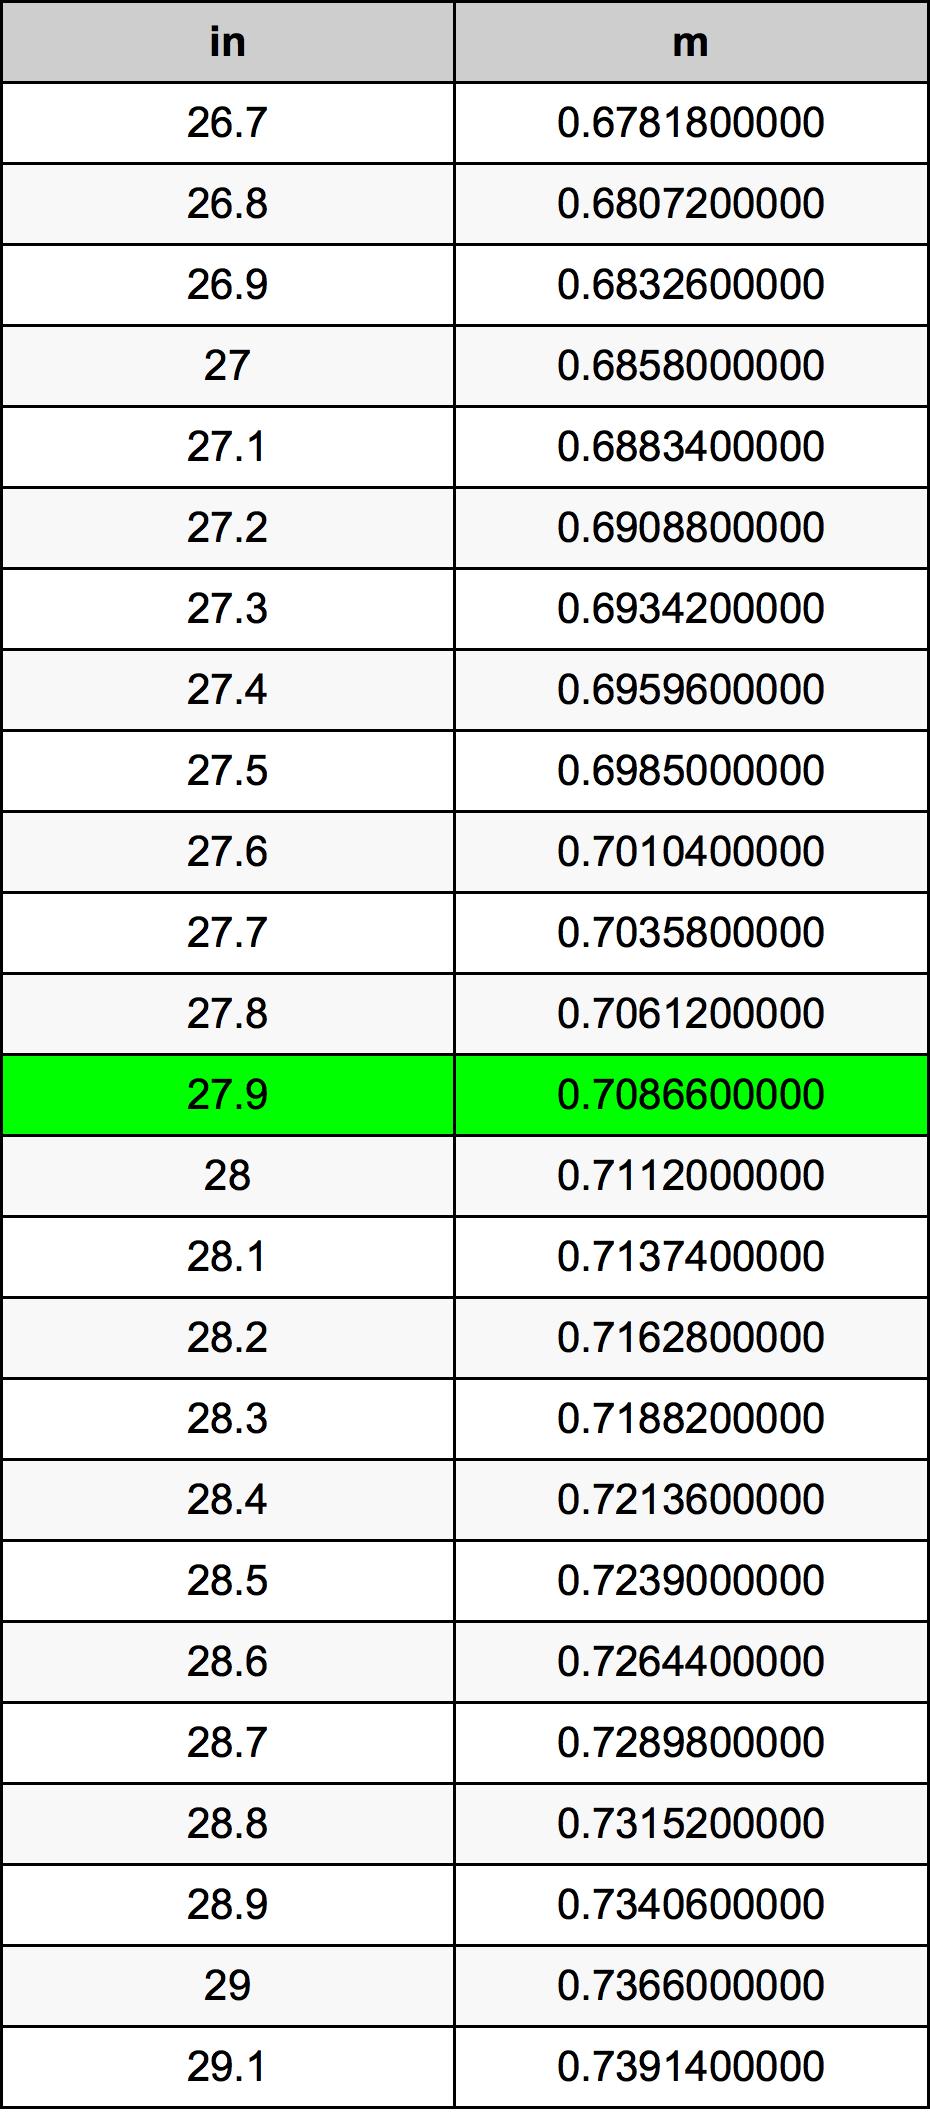 27.9 Inch konverteringstabell